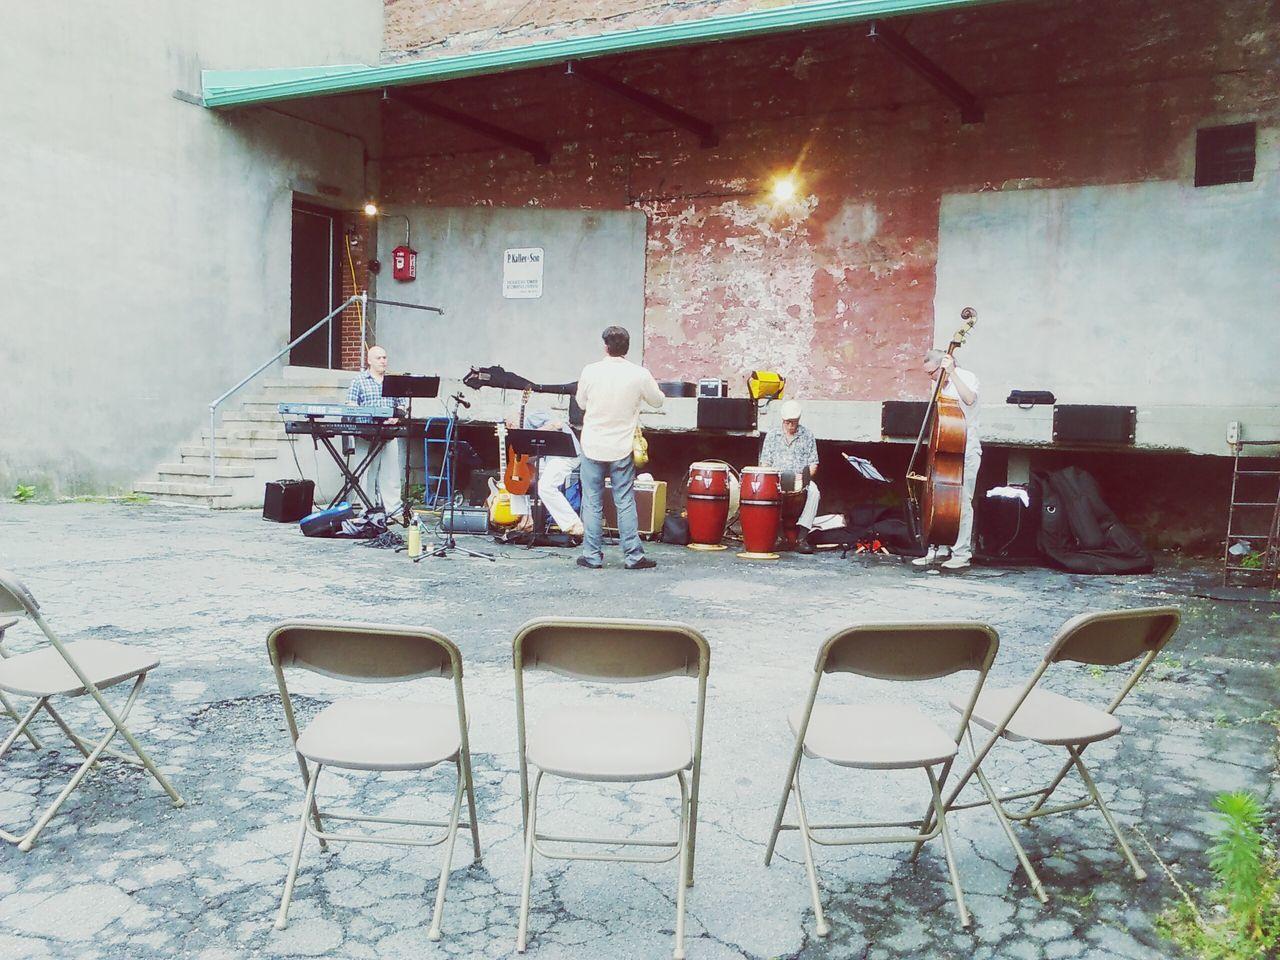 Jazz practice in the alley Music Free Concert Jazzy Alleyway